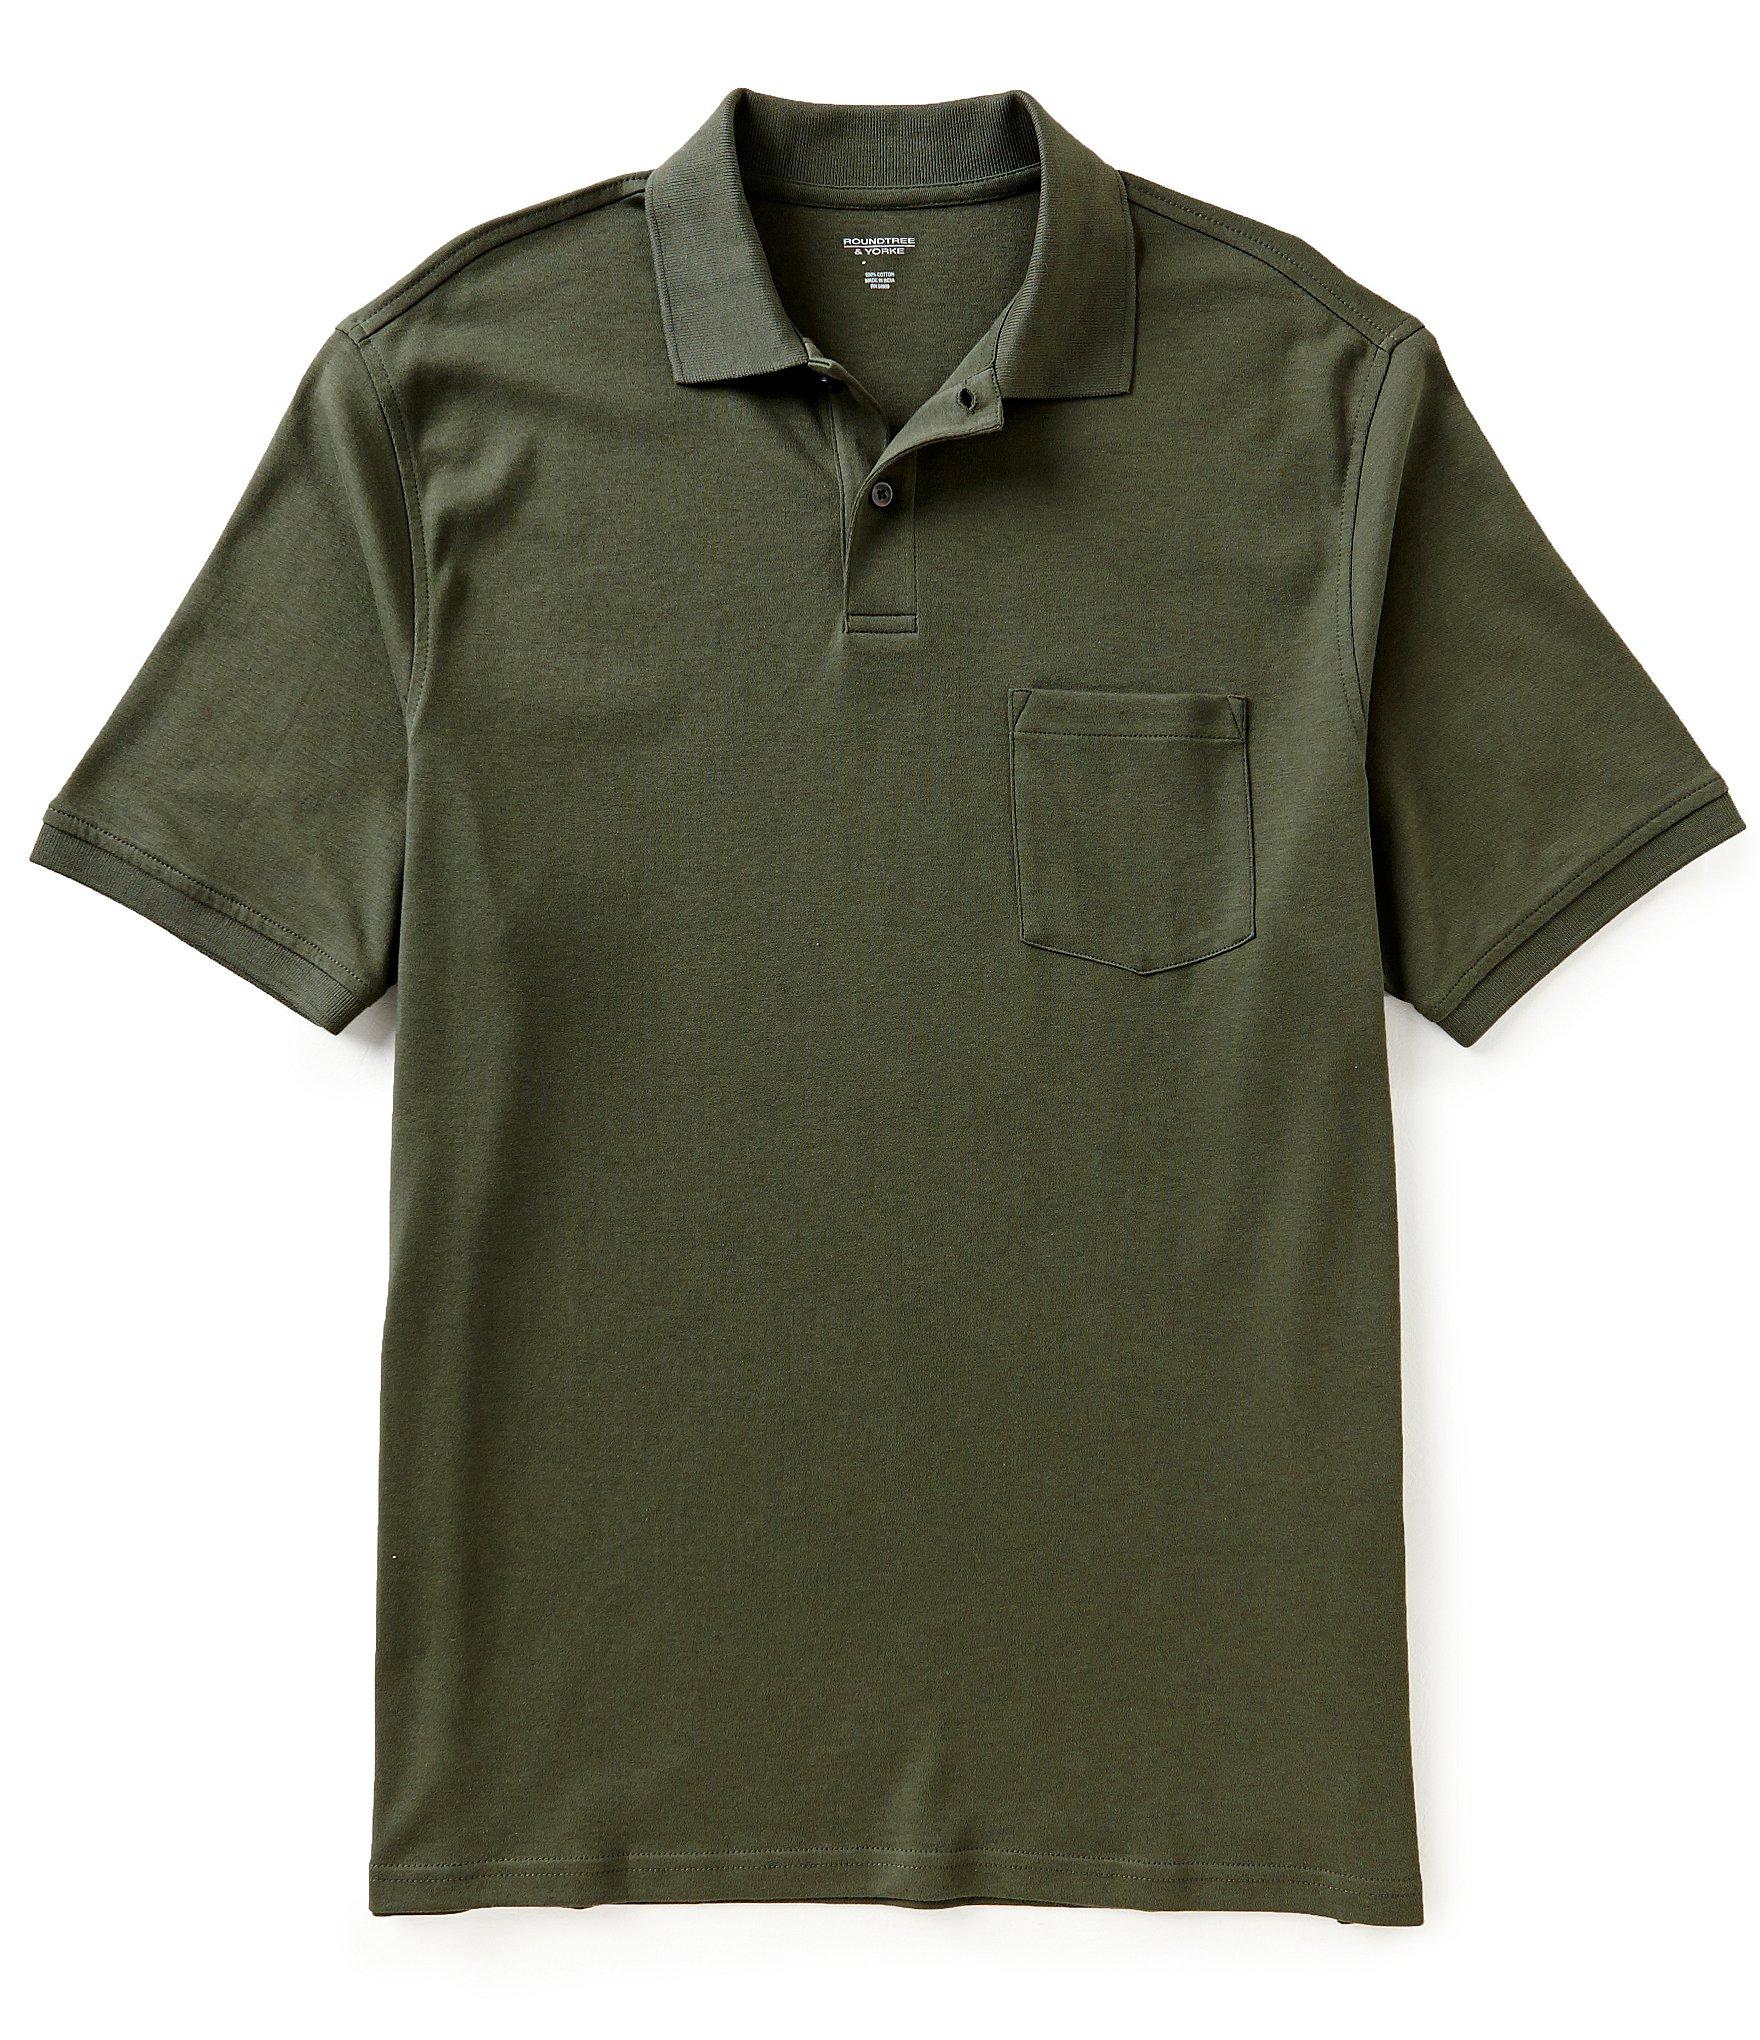 Roundtree yorke silky finish short sleeve solid polo for Short sleeve polo shirt with pocket